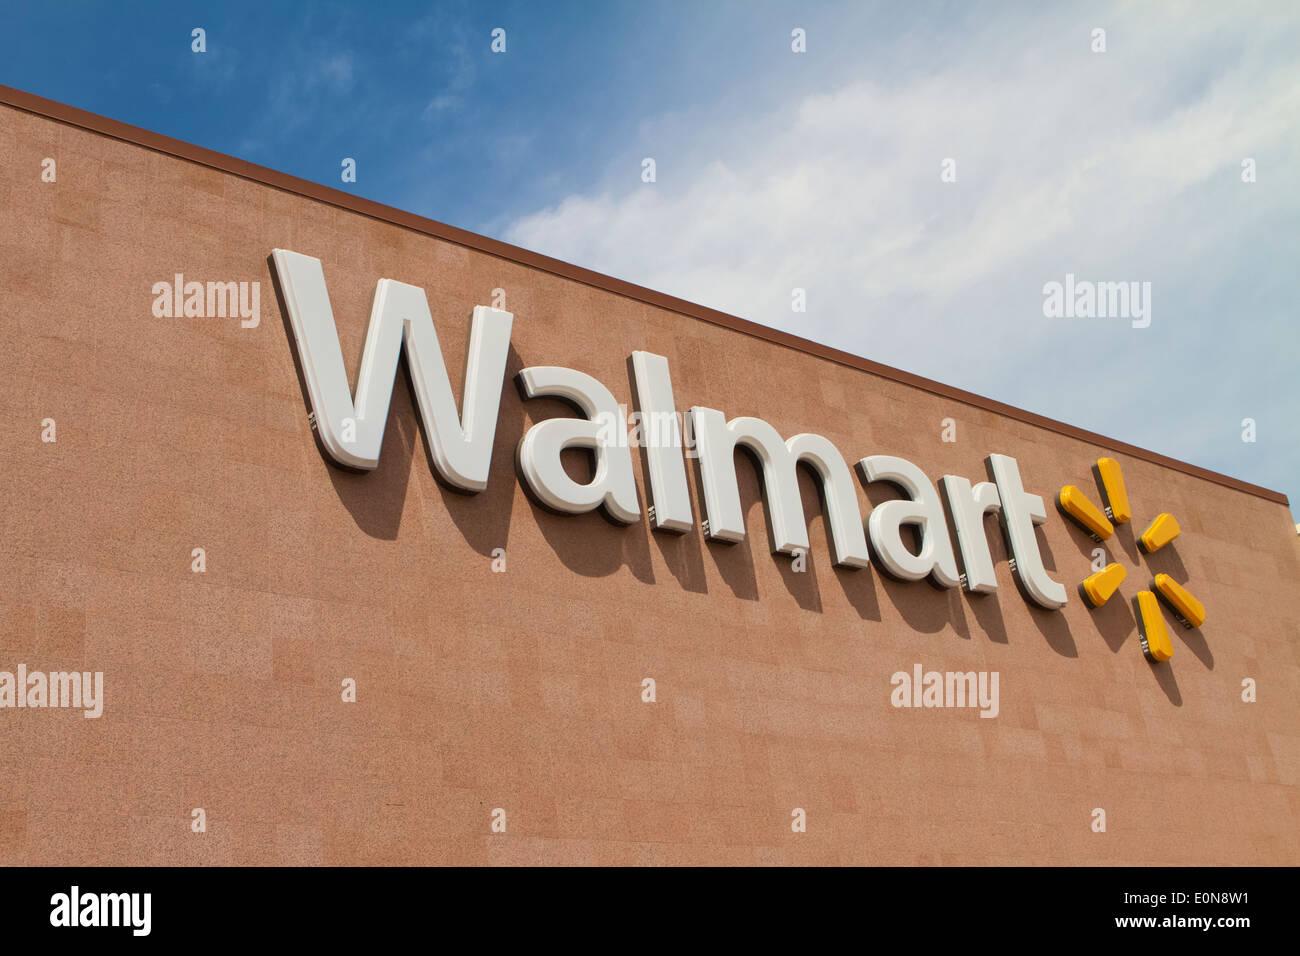 Walmart Store Exterior Stock Photos & Walmart Store Exterior Stock ...